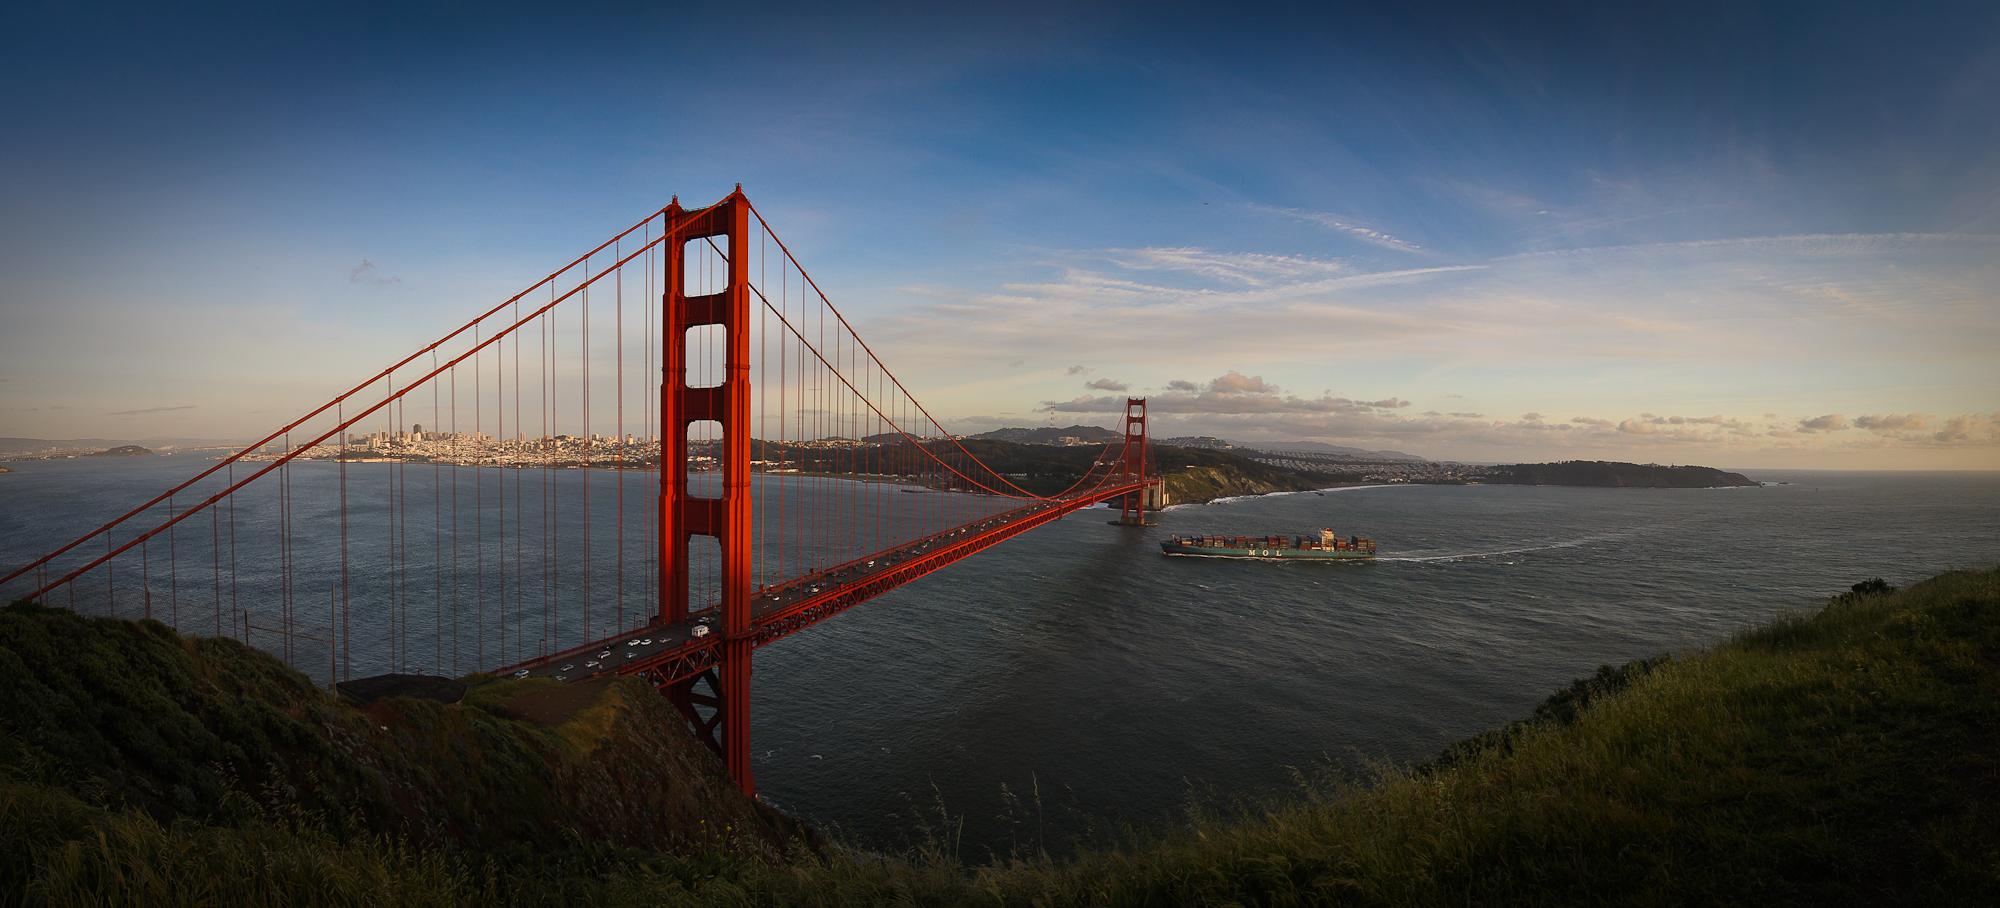 Golden Gate Bridge San Francisco, 17mm, ISO 100, Blende f6,3, Belichtung 1/160s